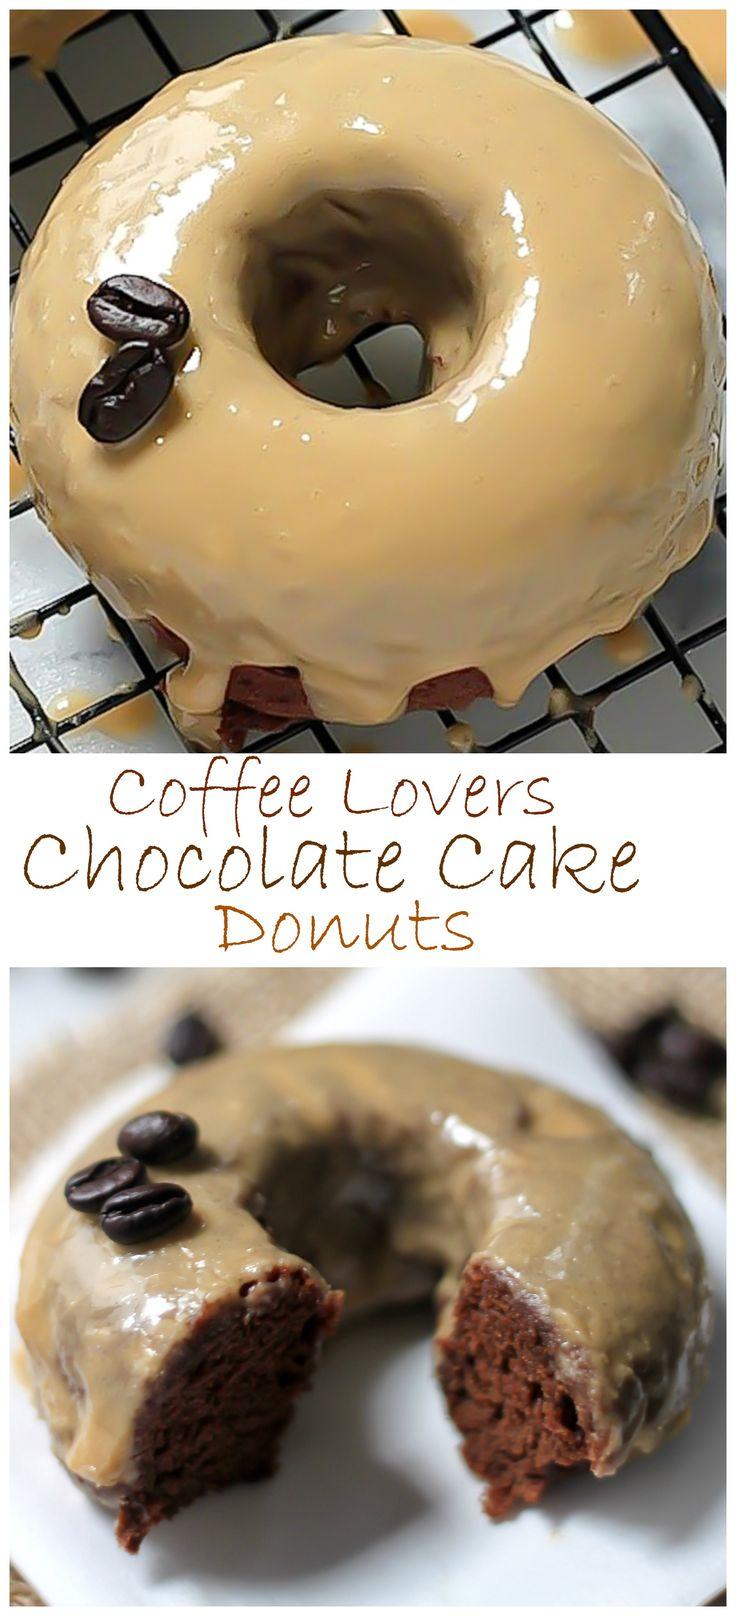 Coffee lovers chocolate cake donuts